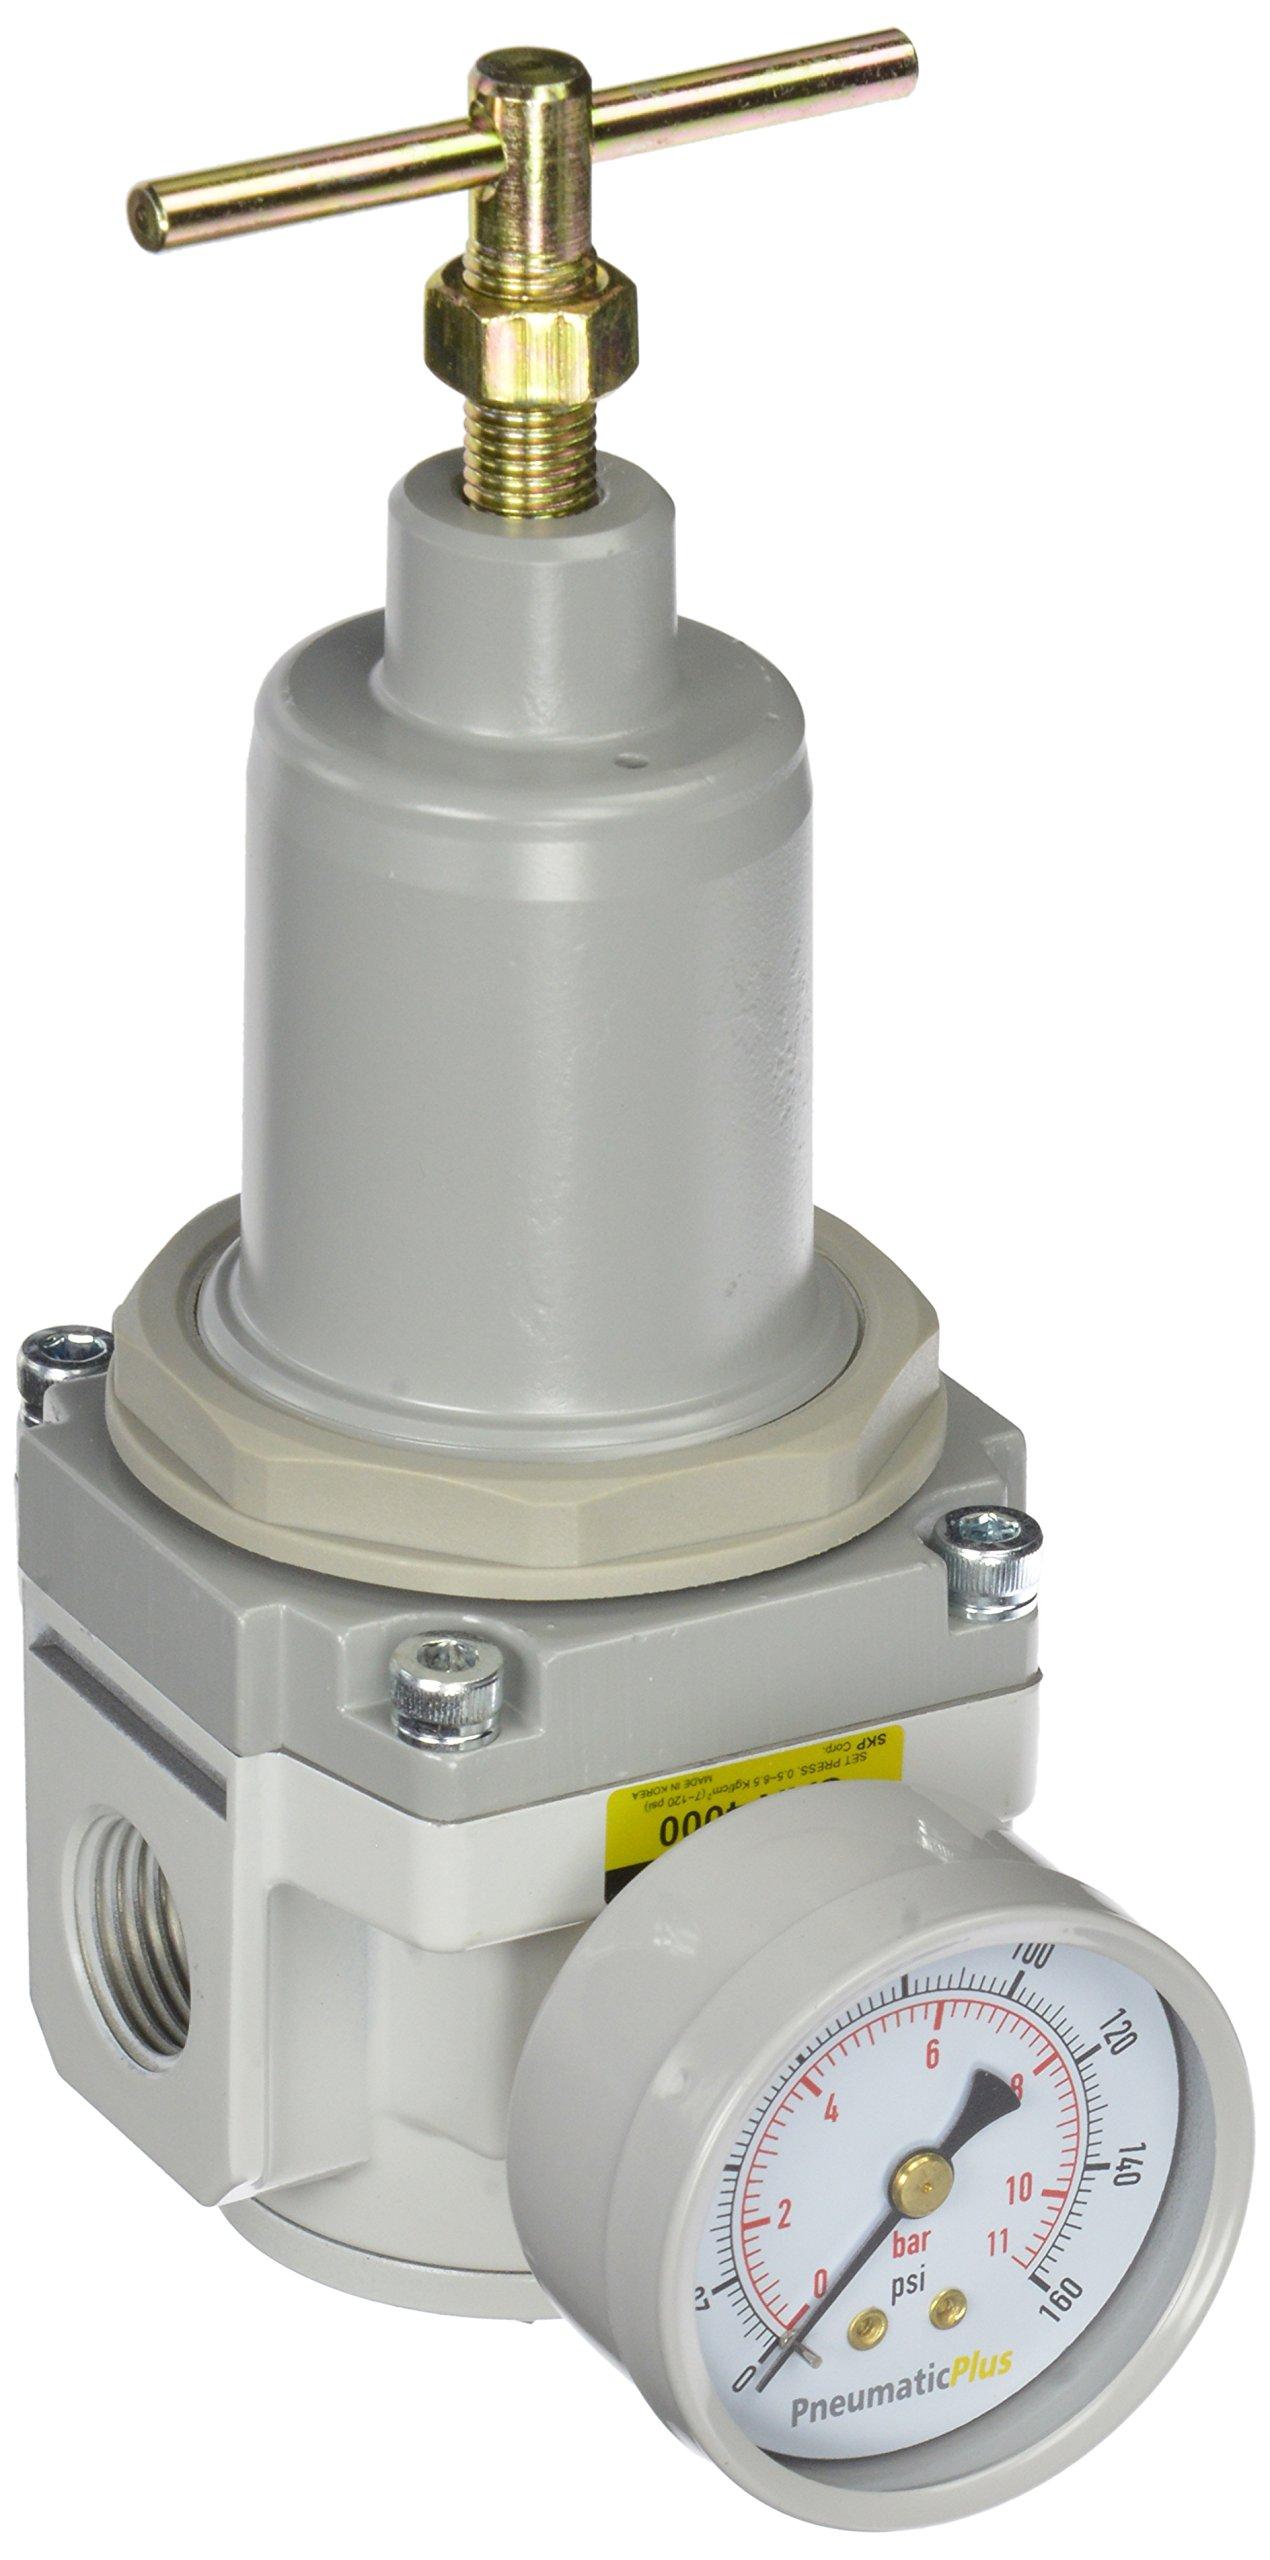 PneumaticPlus SAR4000T-N04BG Air Pressure Regulator T-Handle 1/2'' NPT with Gauge & Bracket